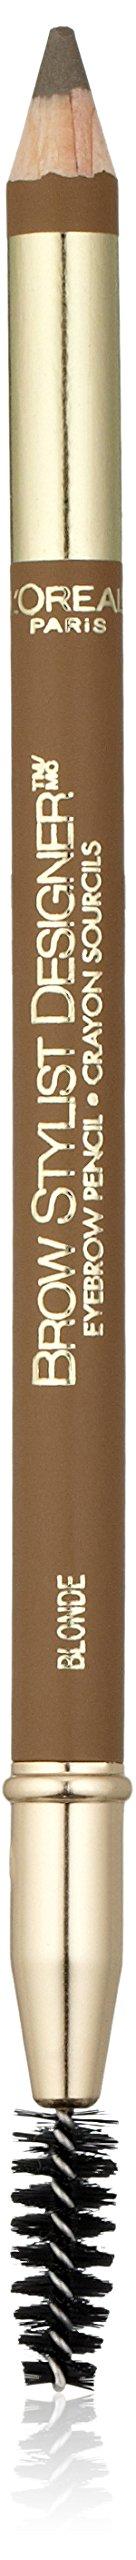 L'Oreal Paris Makeup Brow Stylist Designer Eyebrow Pencil, Blonde (Packaging May Vary)